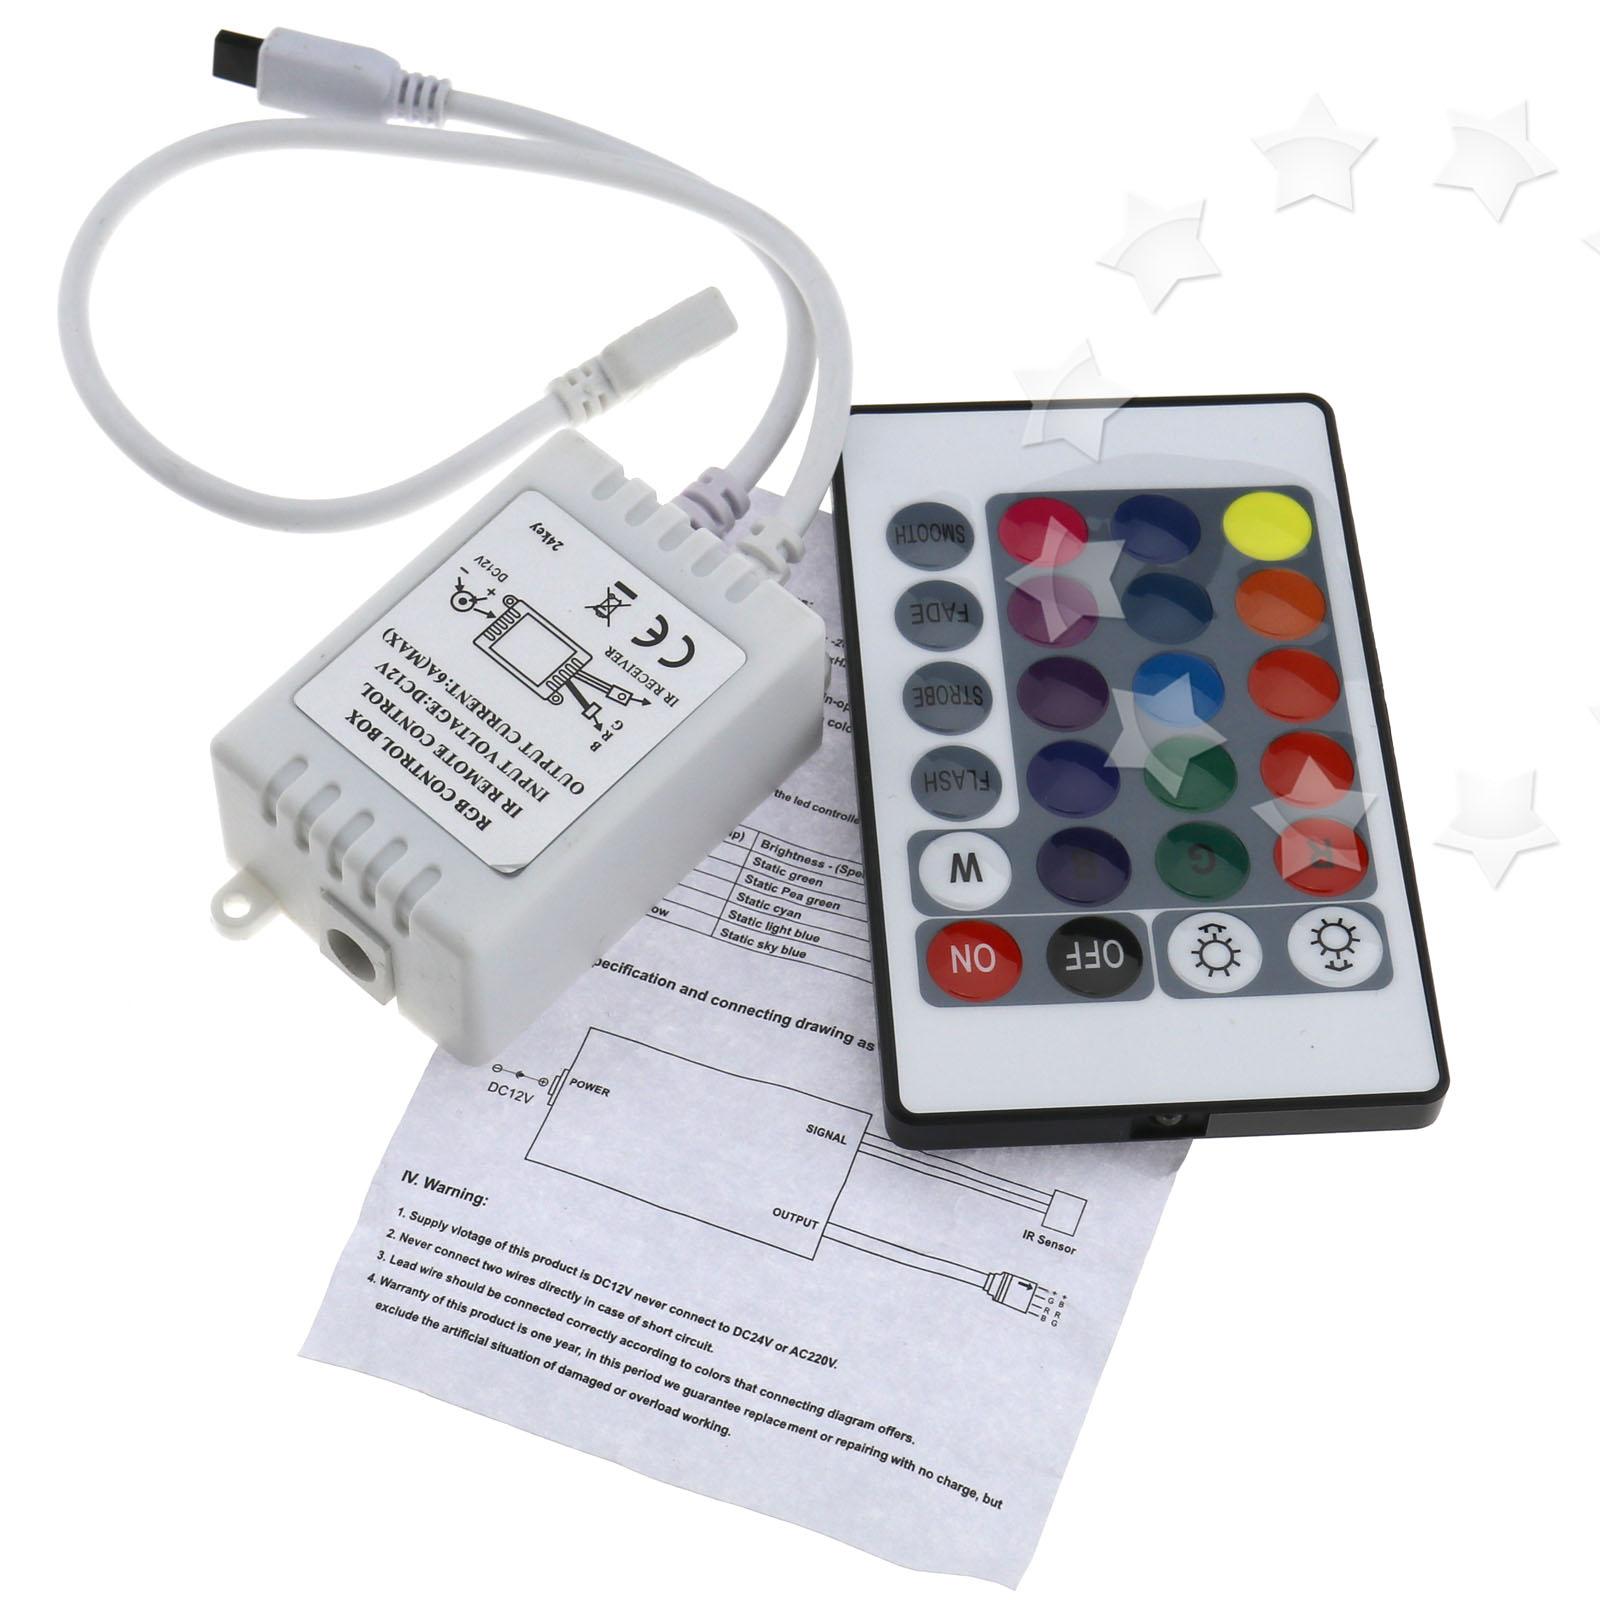 24 Key Control Box Ir Remote Controller For Led Rgb 5050 3528 Strip Irremotecontrolcircuitdiagram2jpg Light Lamp